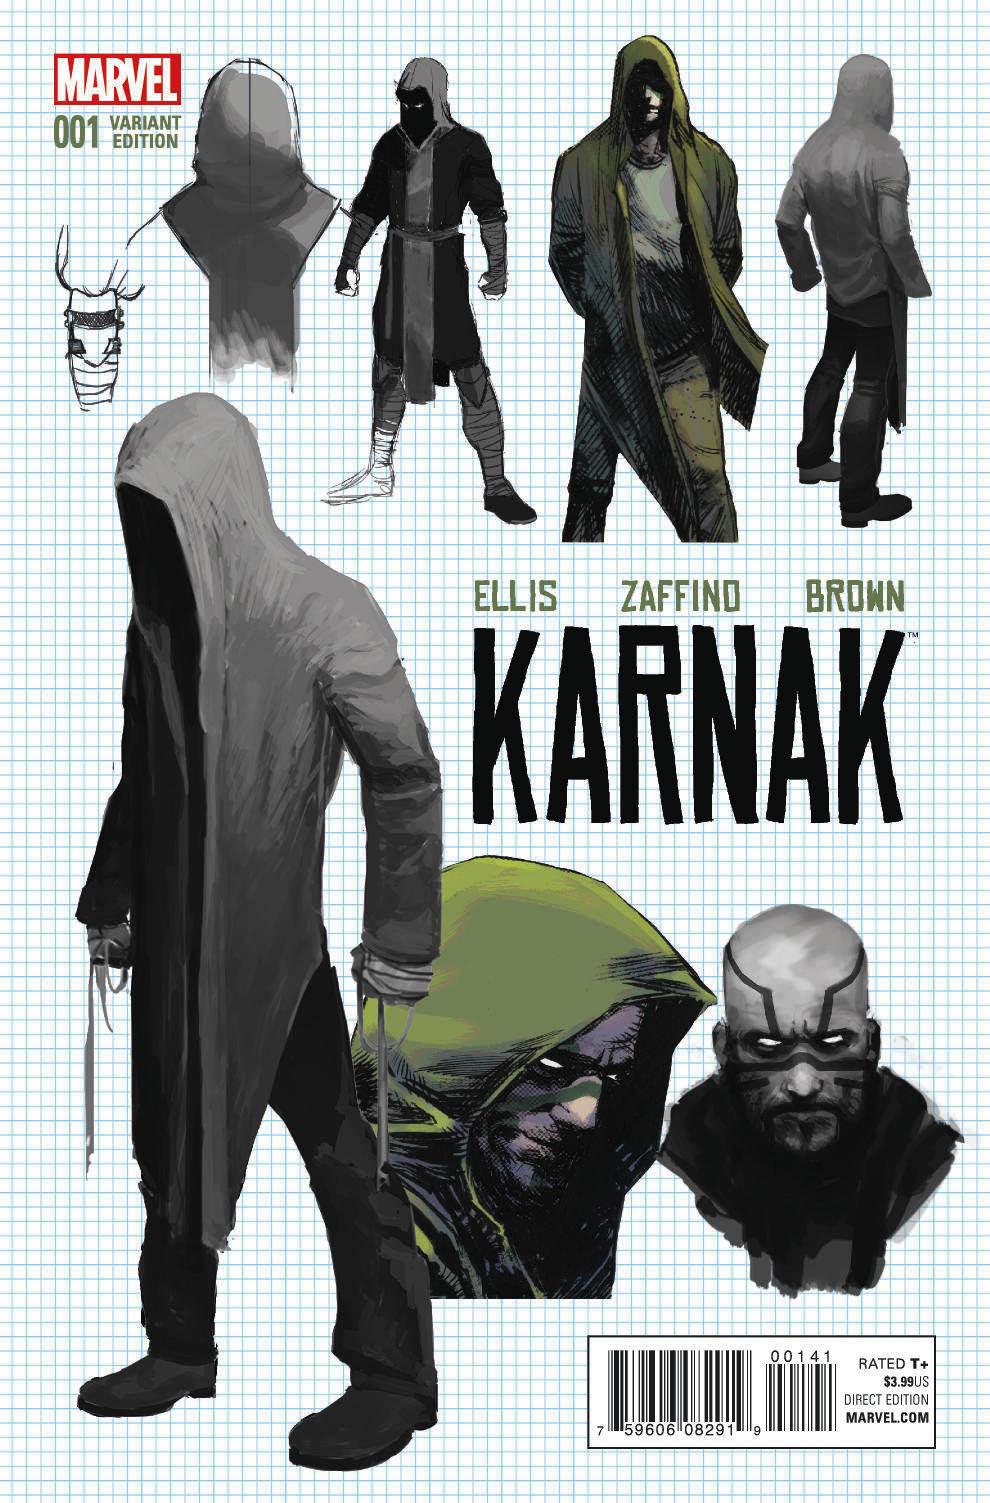 http://source.superherostuff.com/wp-content/uploads/2015/09/Karnak_1_Zaffino_Design_Variant.jpg